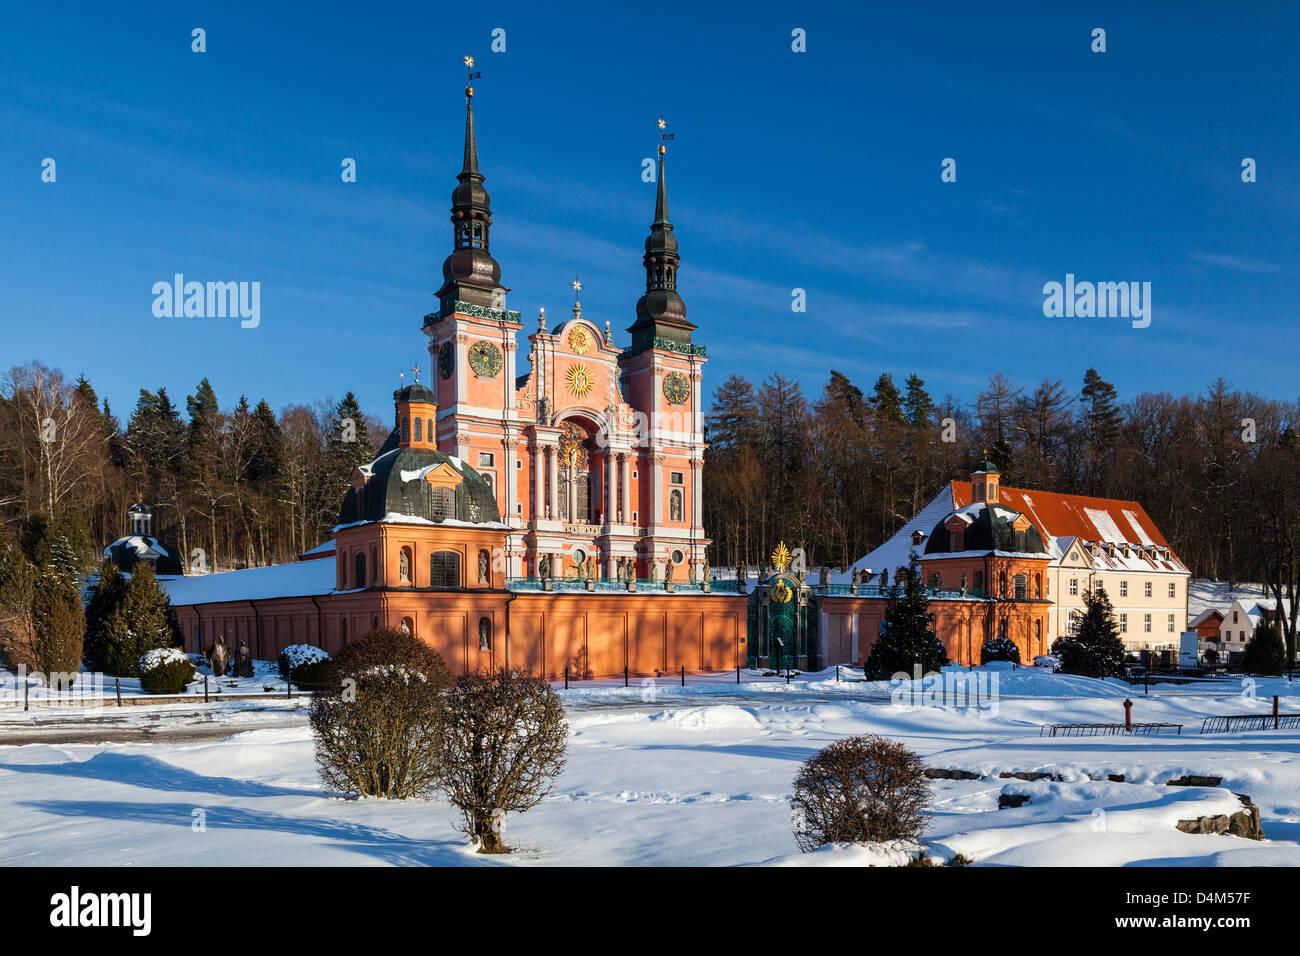 Swieta Lipka (Holy Lime), baroque Pilgrimage Church, Masuria region Poland - Stock Image